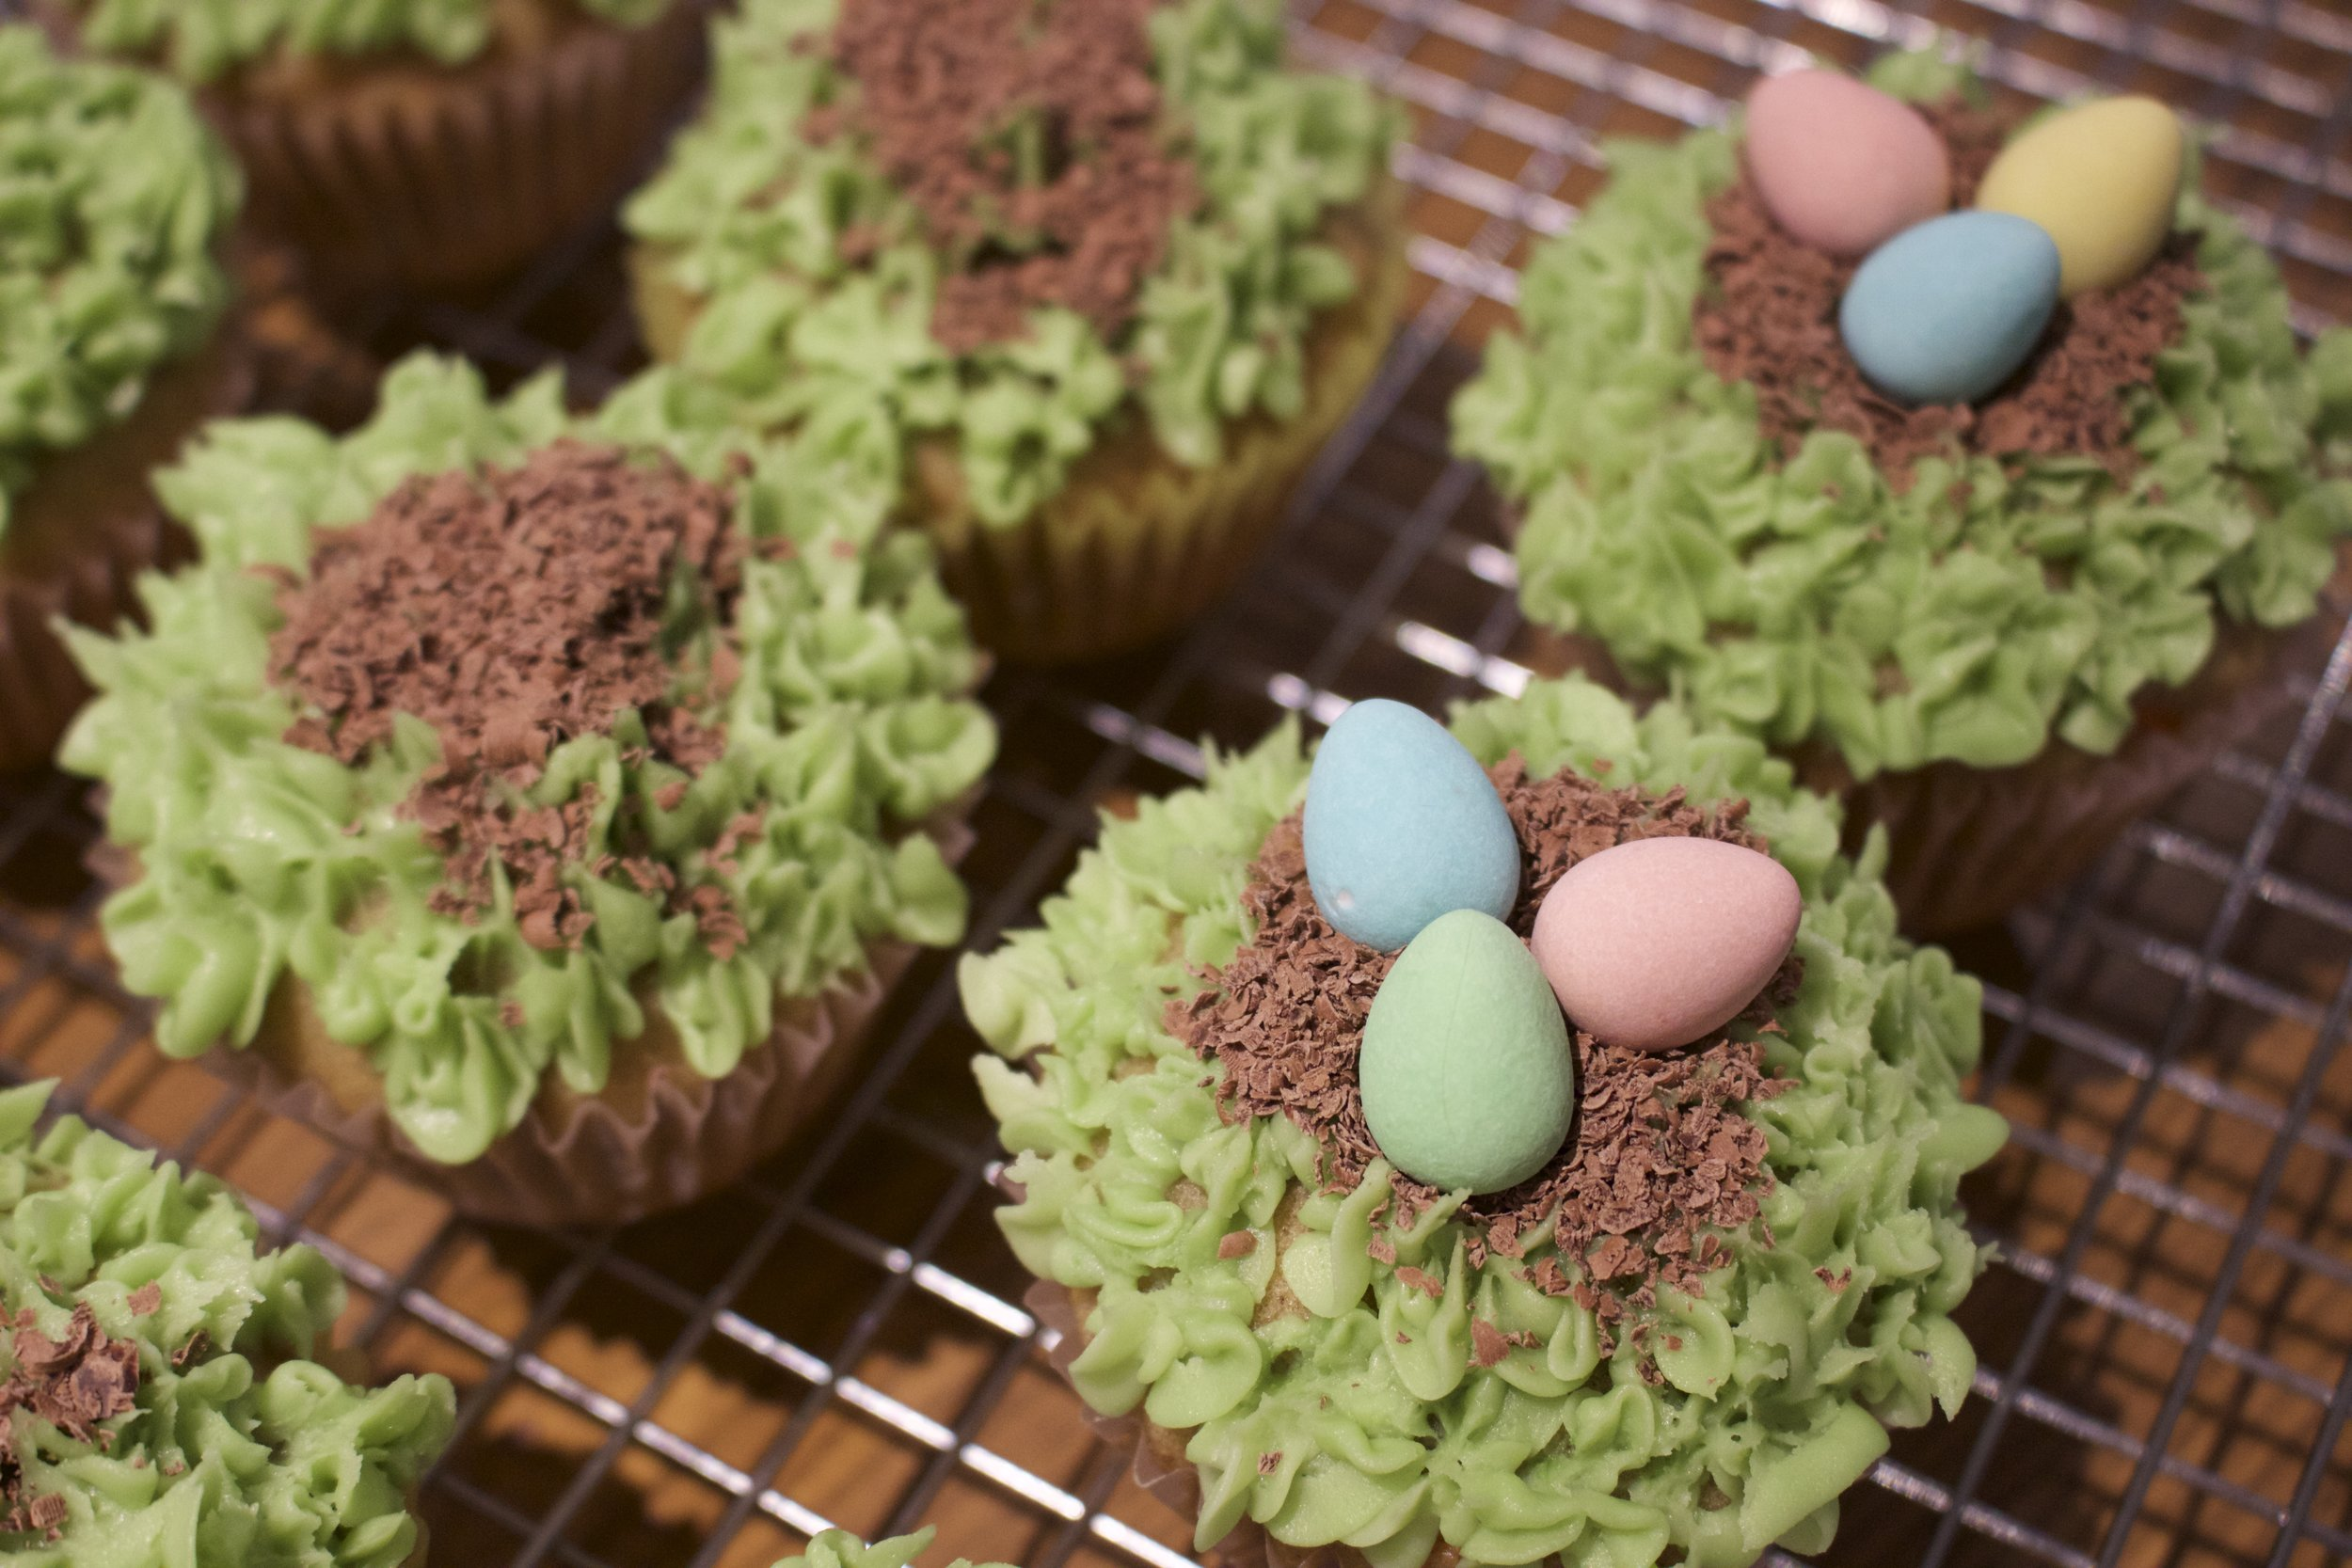 Dark chocolate shavings for the nest and mini eggs